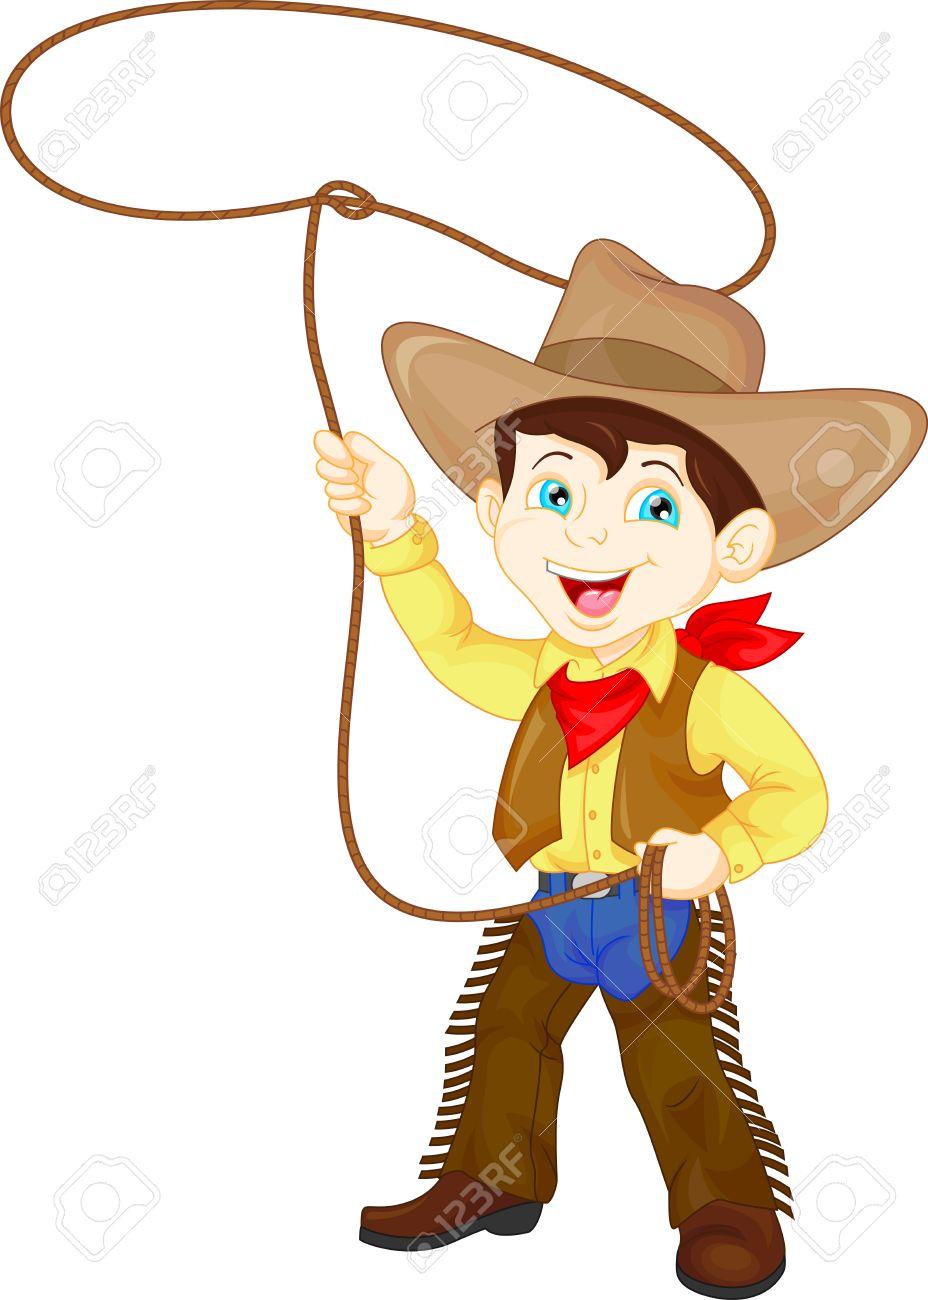 Cowboy kid twirling a lasso.